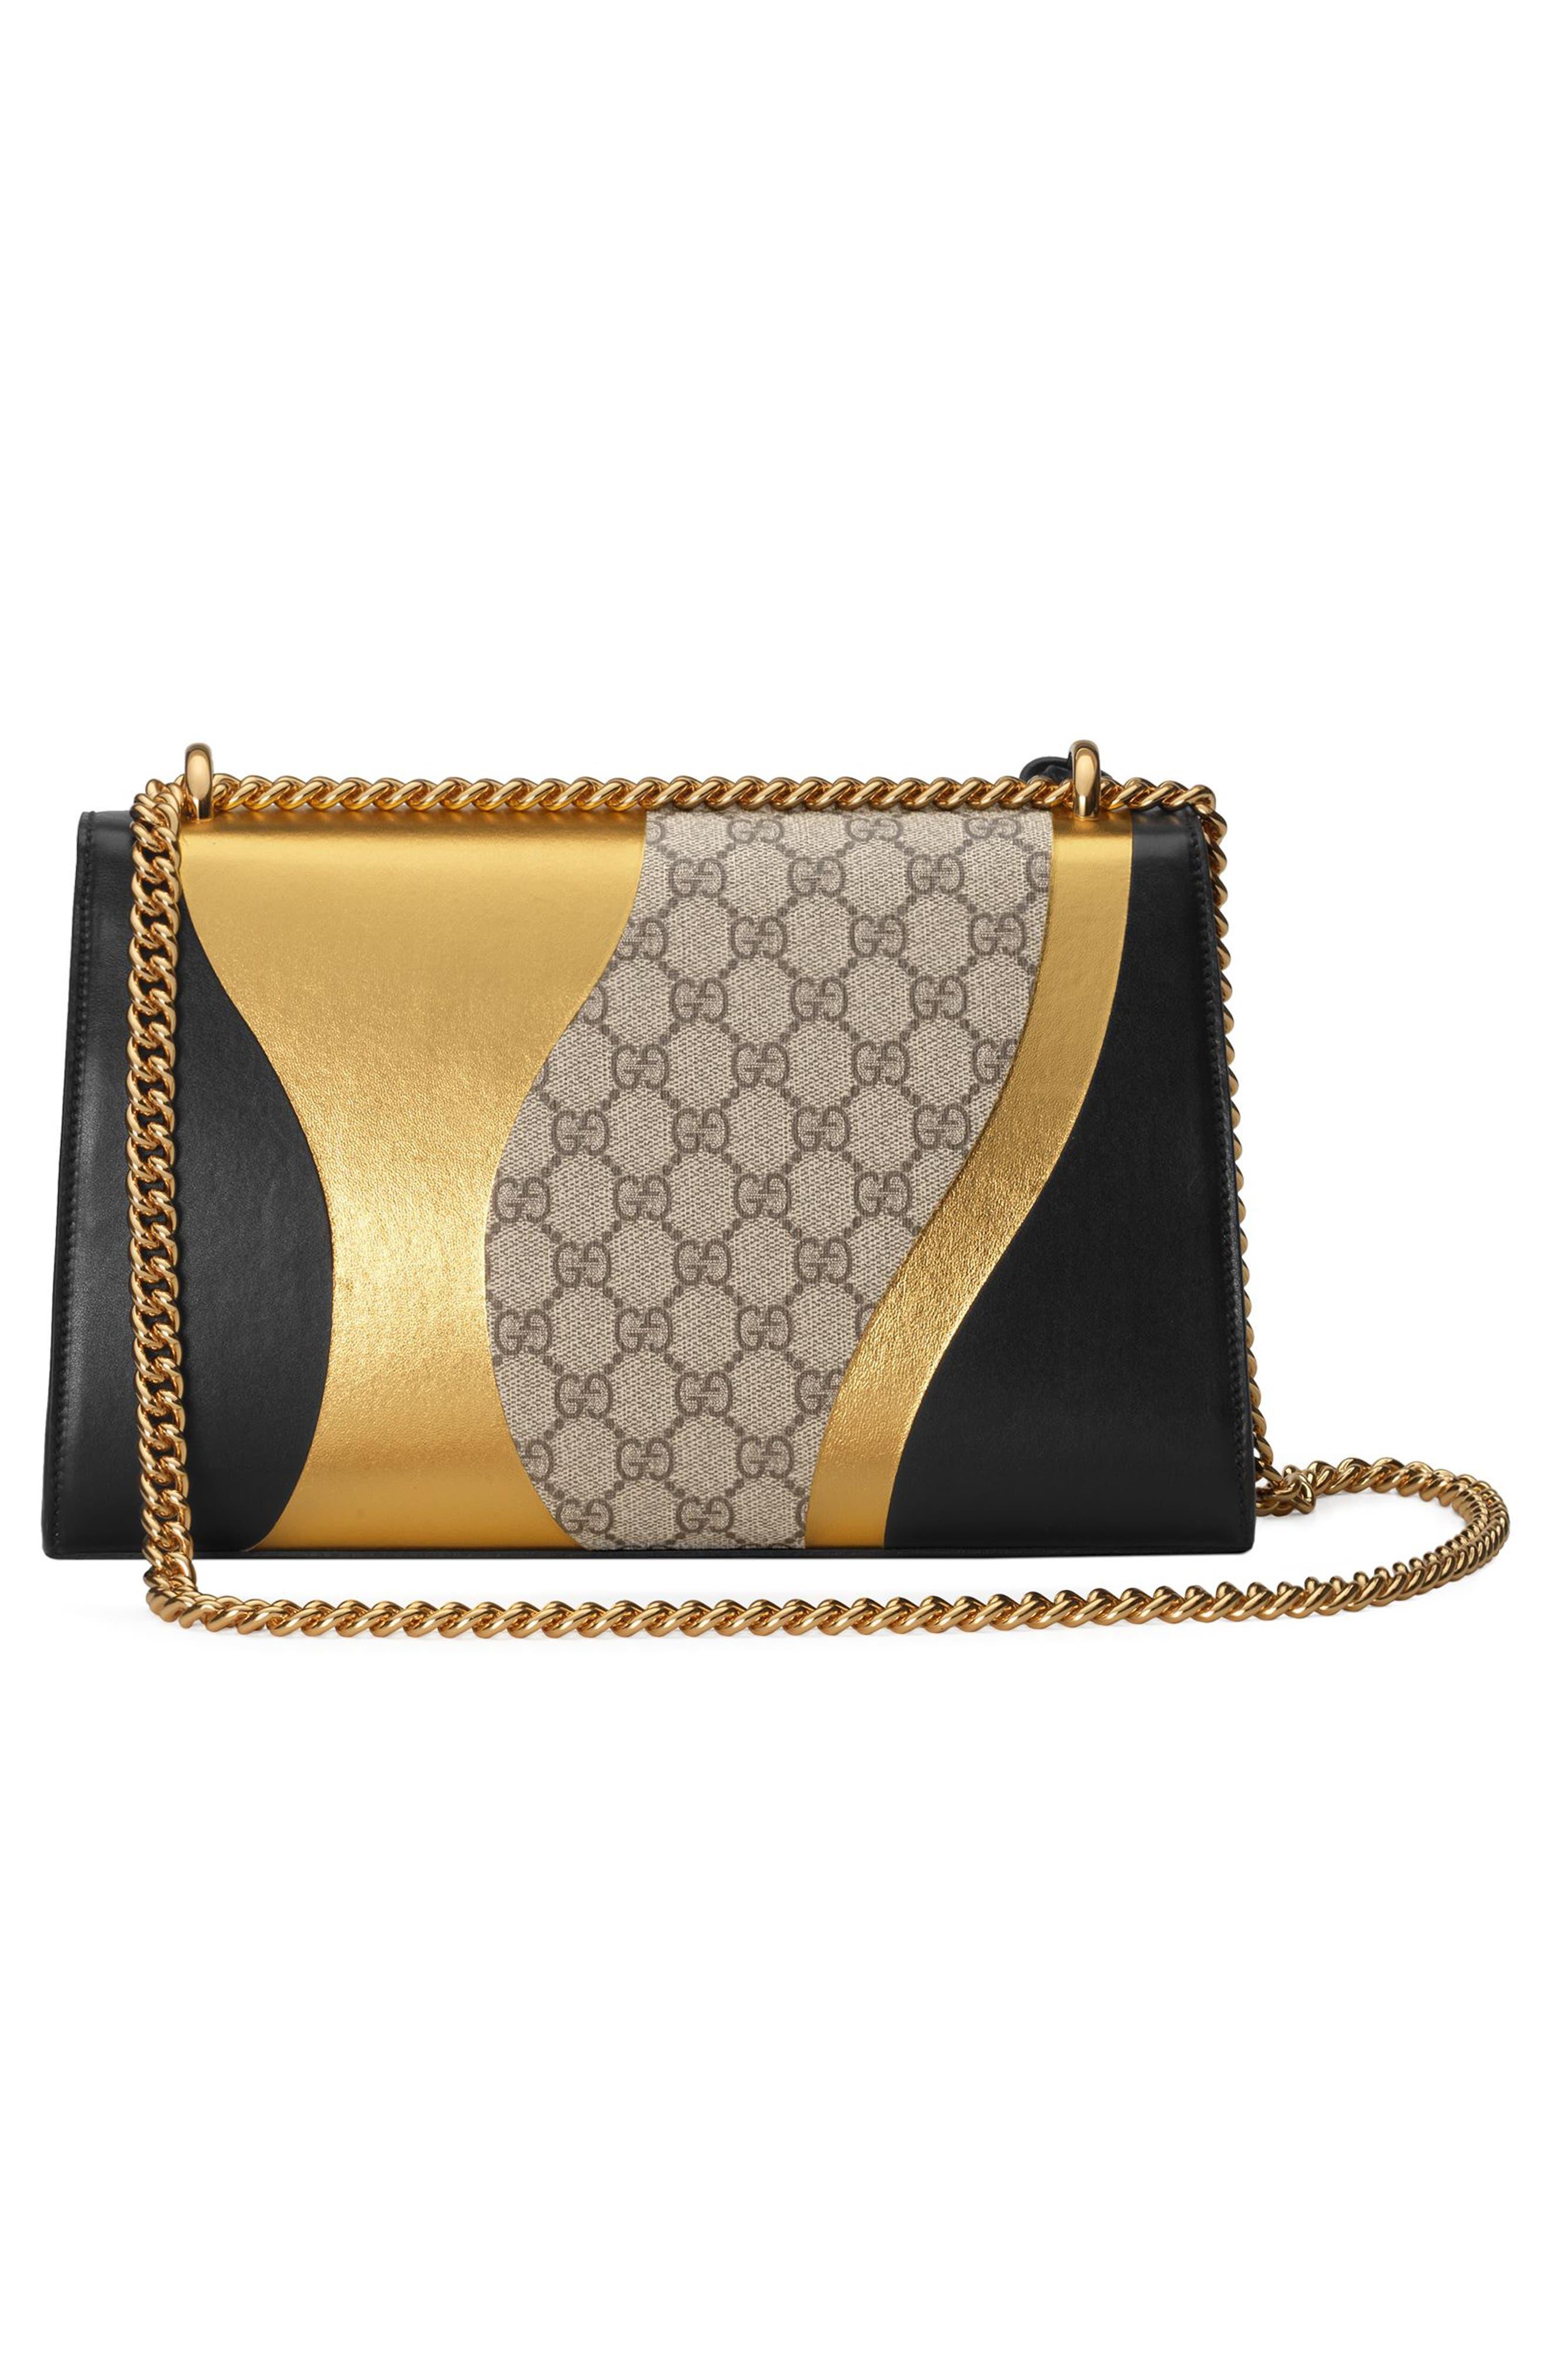 Medium Padlock GG Supreme Canvas & Leather Shoulder Bag,                             Alternate thumbnail 2, color,                             NERO/ORO VECCHIO